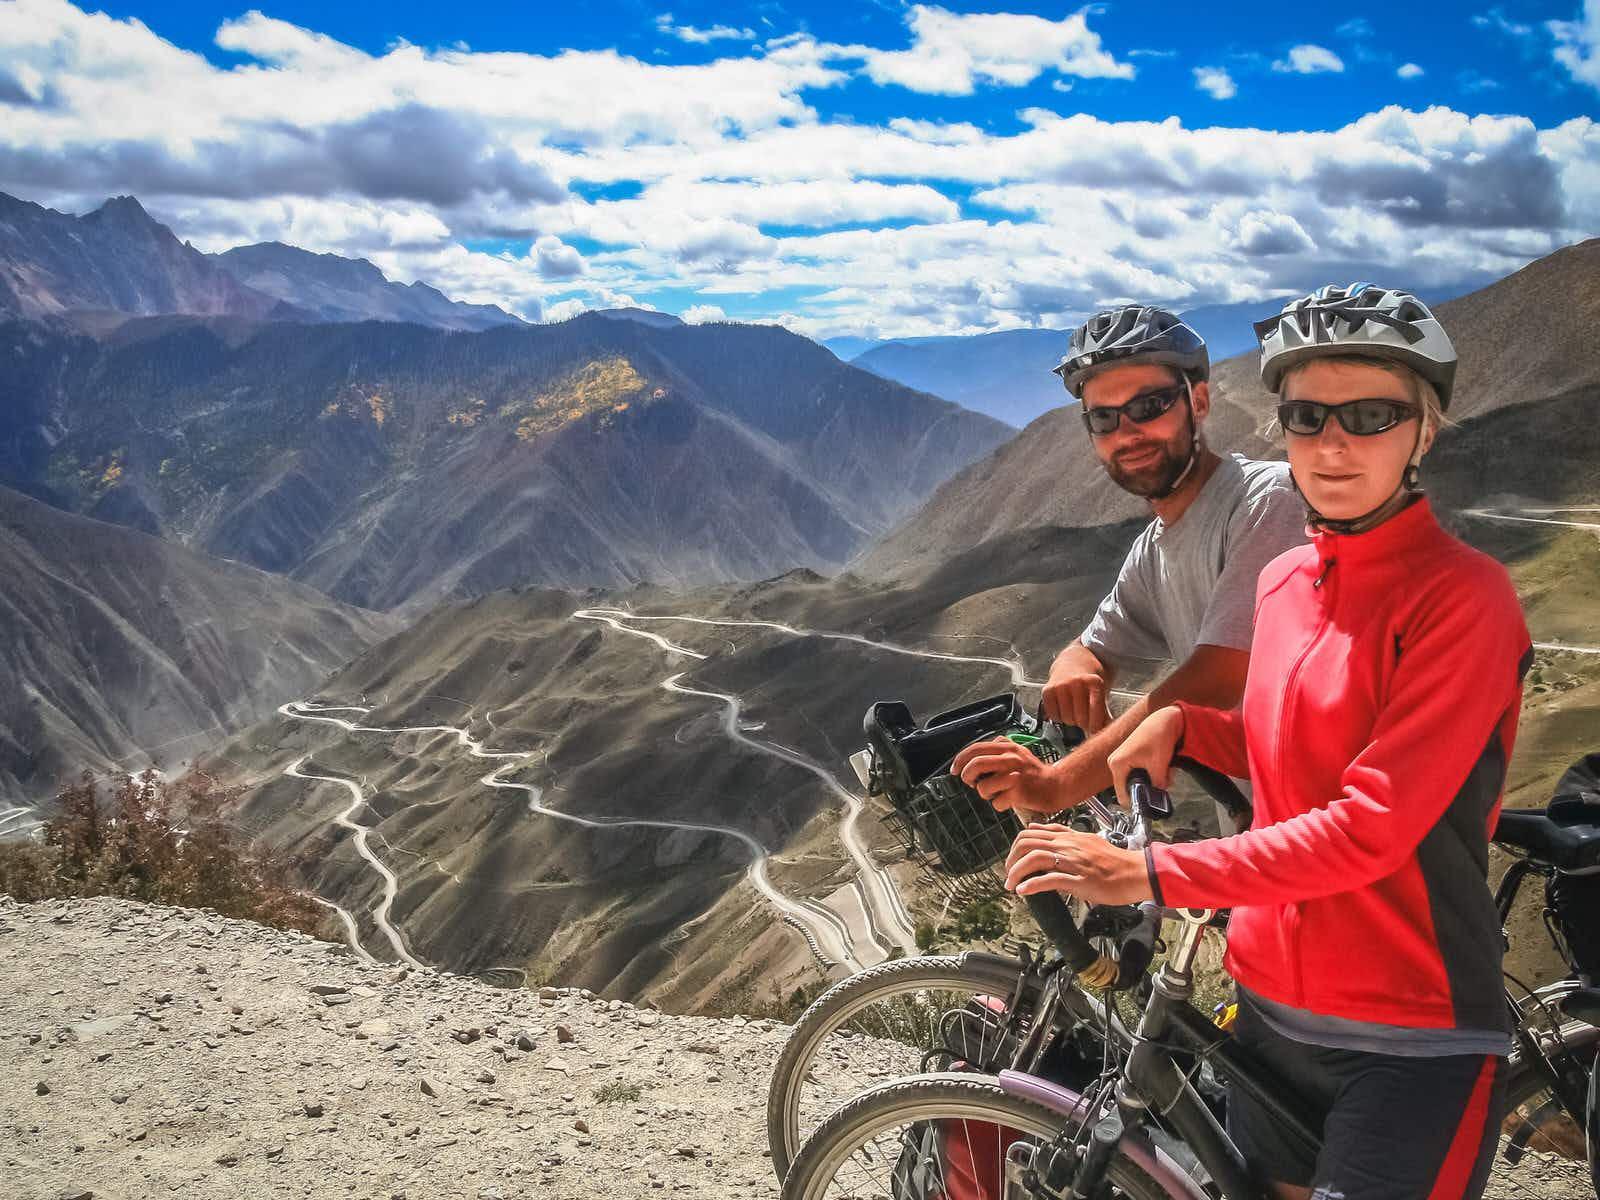 Shangri-la on two wheels: cycling adventures in Yunnan